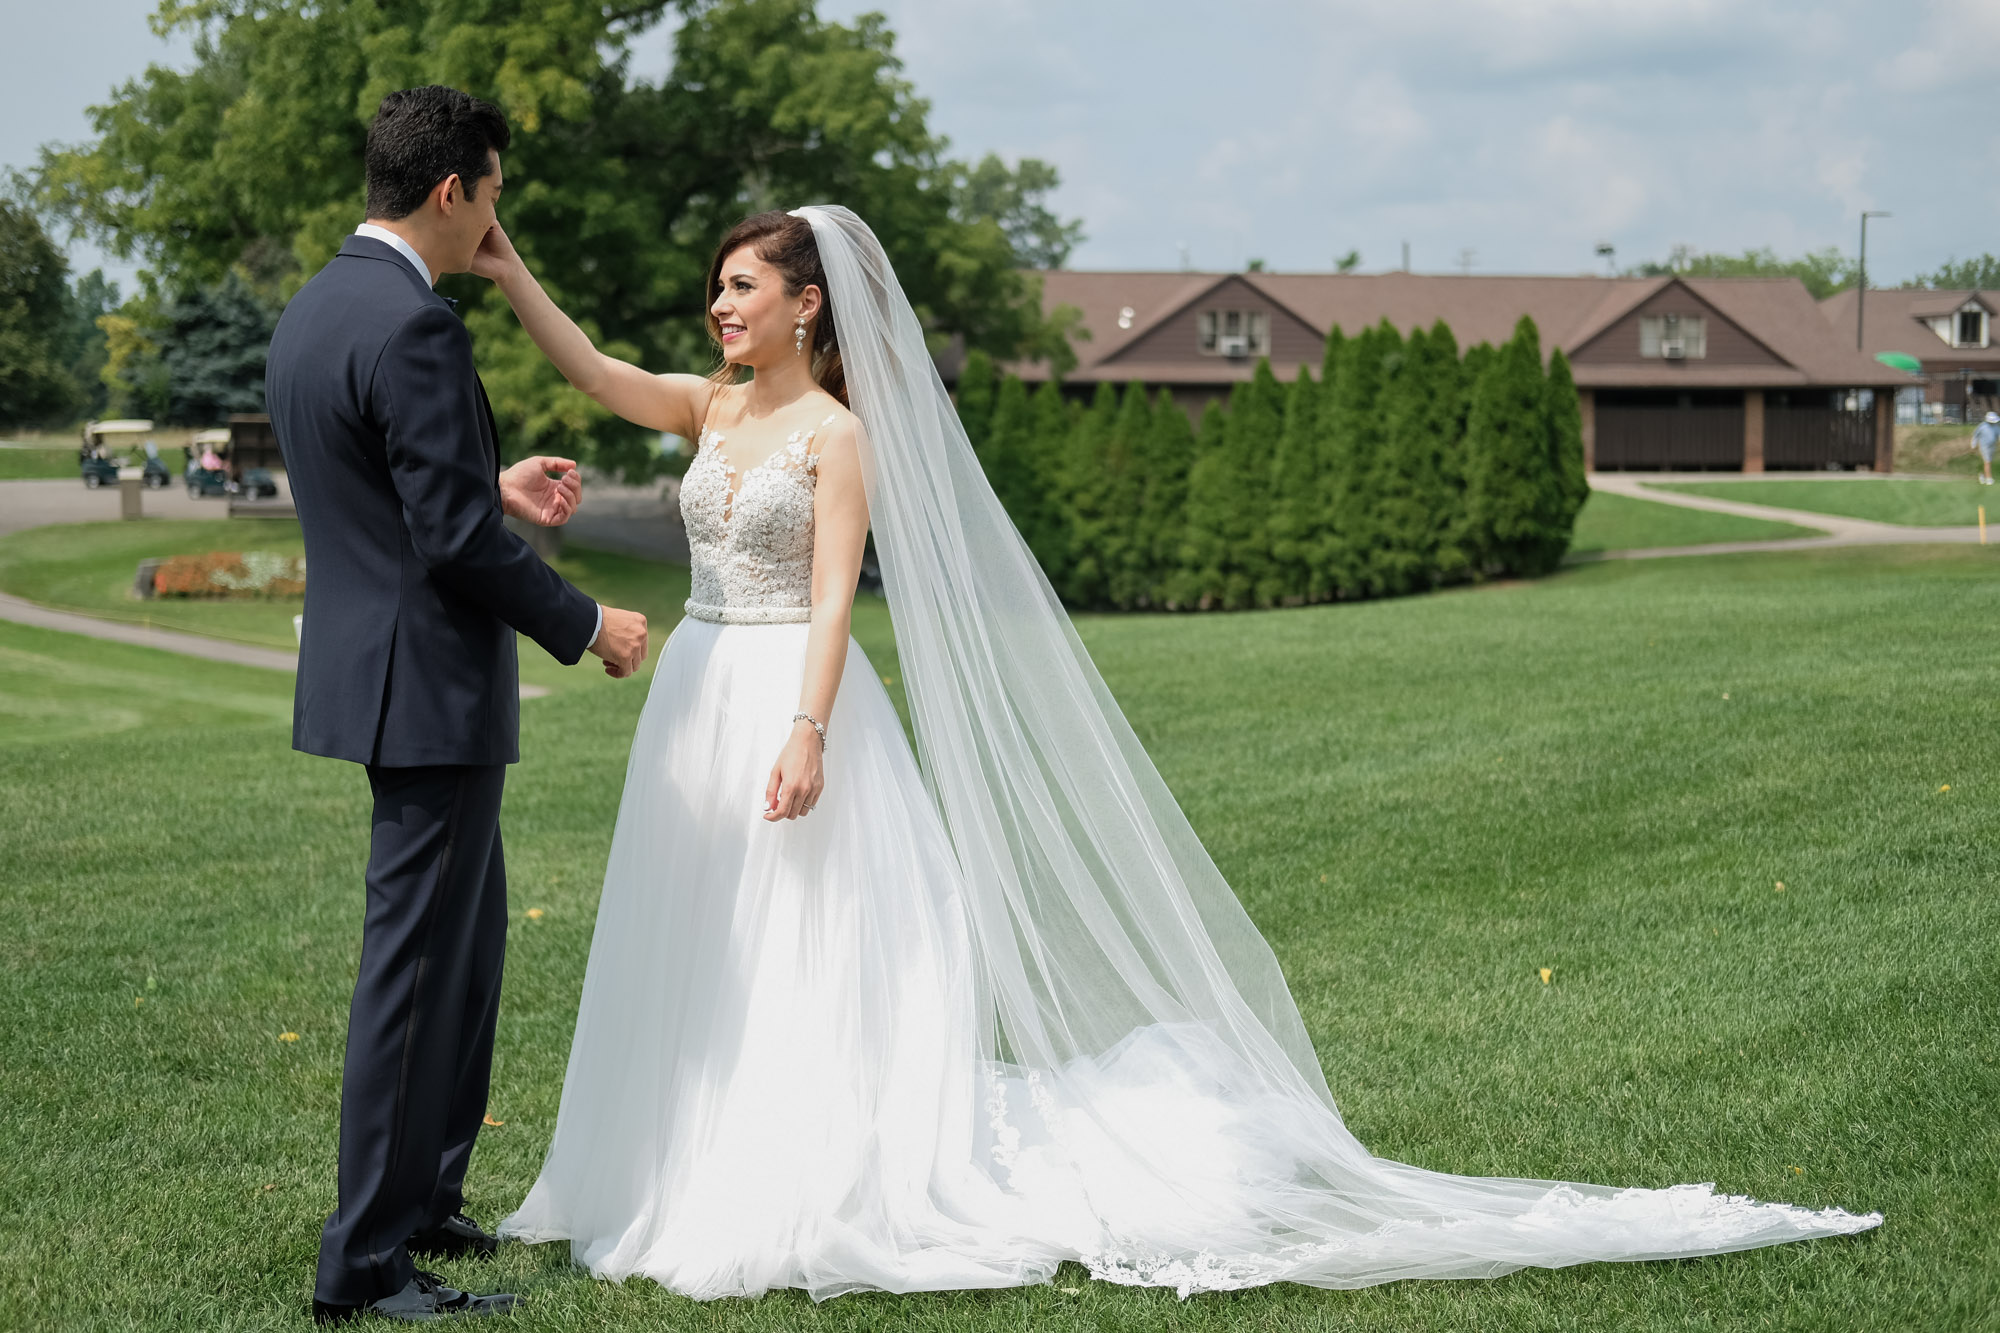 sylvania-country-club-wedding-photos-56.jpg